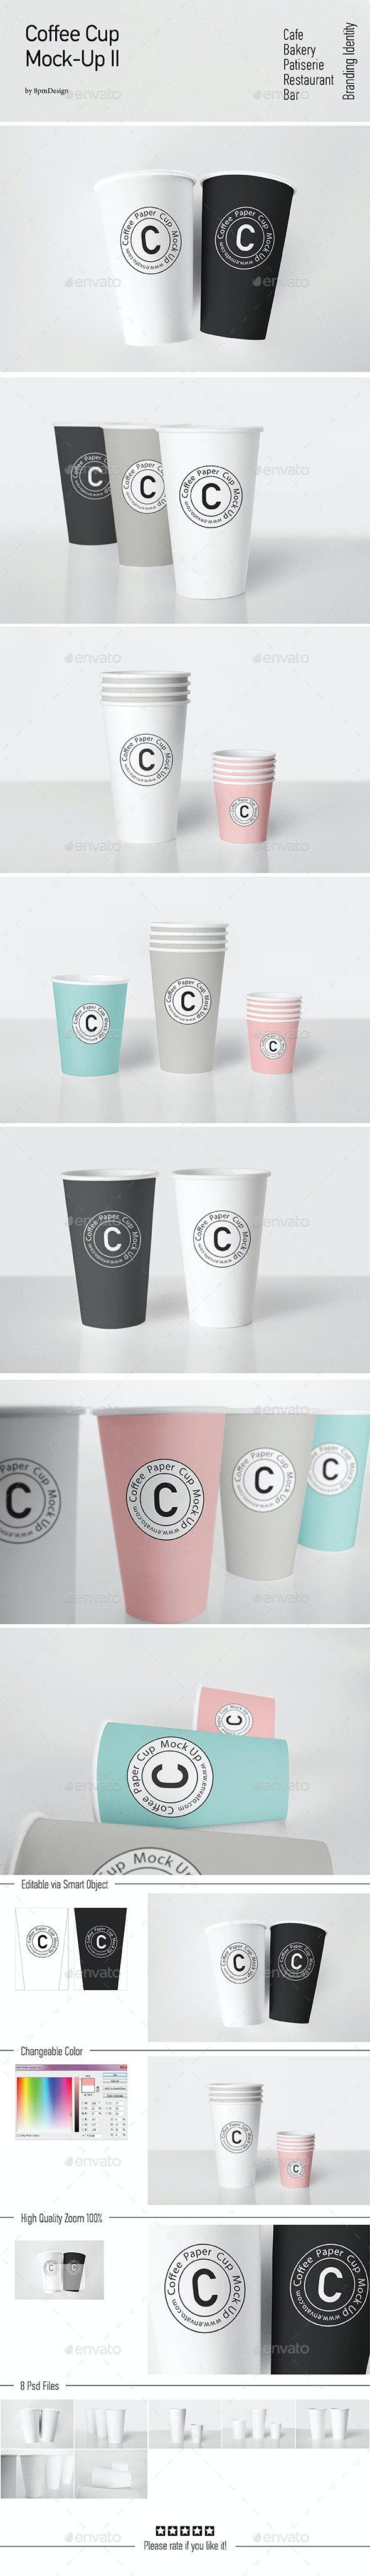 Coffee Cup Mock-Up II - Food and Drink Packaging